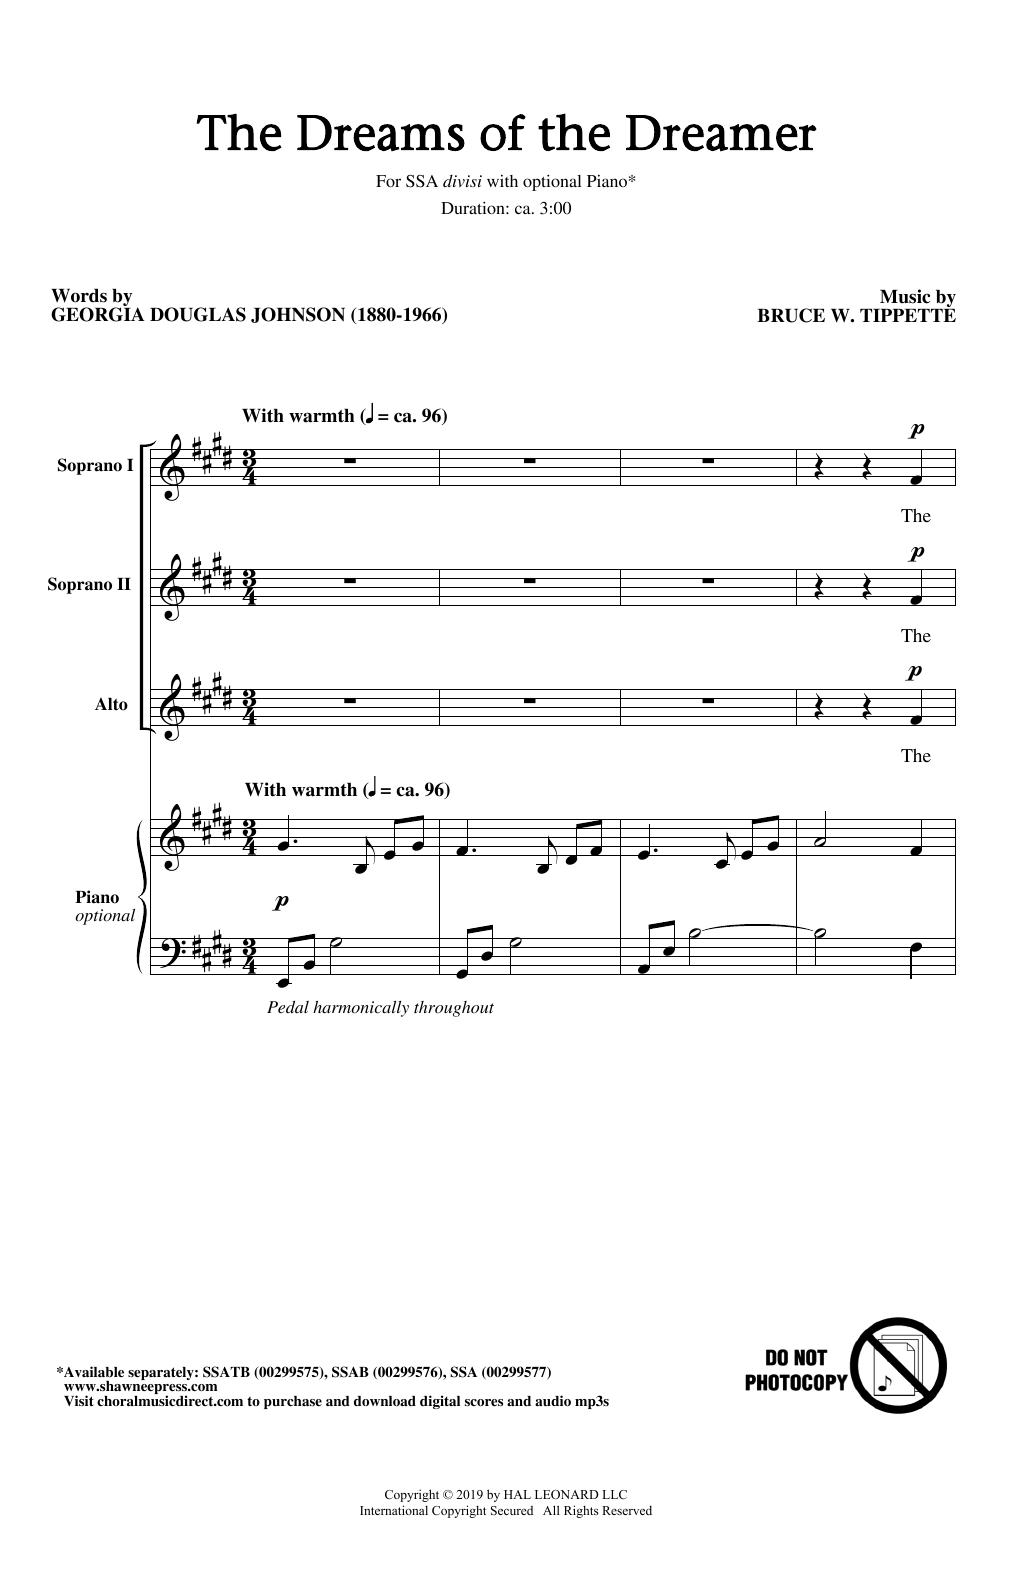 The Dreams Of The Dreamer (SSA Choir)